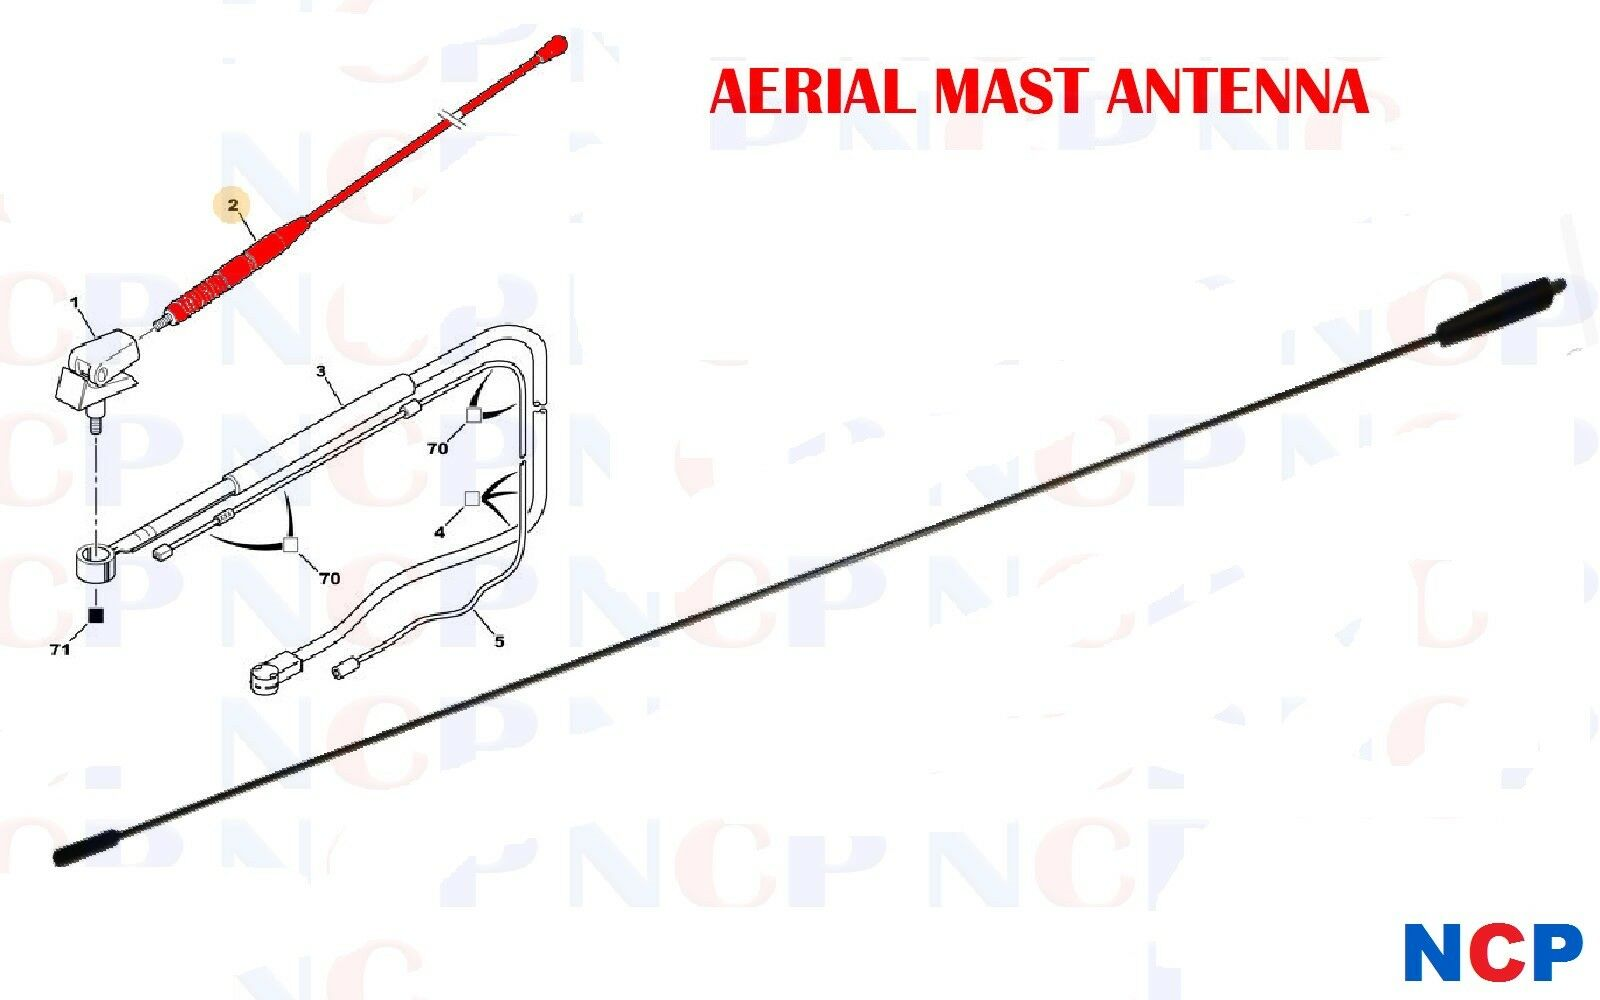 PEUGEOT 106 206 306 406 806 EXPERT PARTNER AERIAL MAST